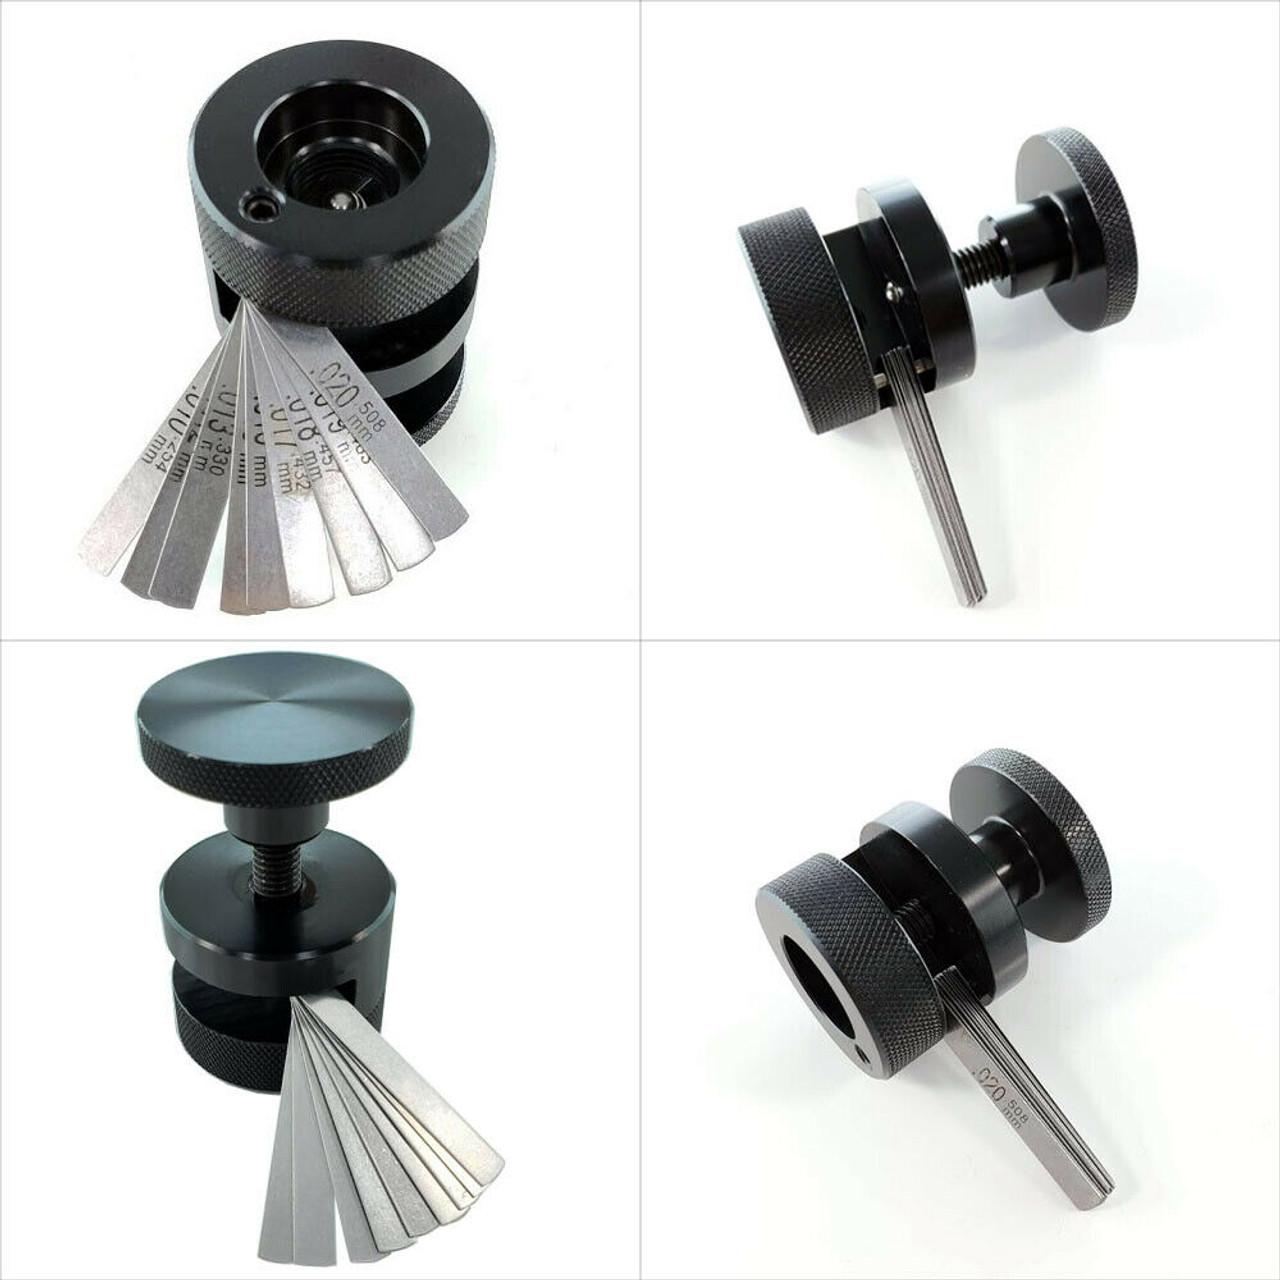 Spark Plug Gap Tool /& Gauge T/&E Tools 7010 automotive power equipment marine